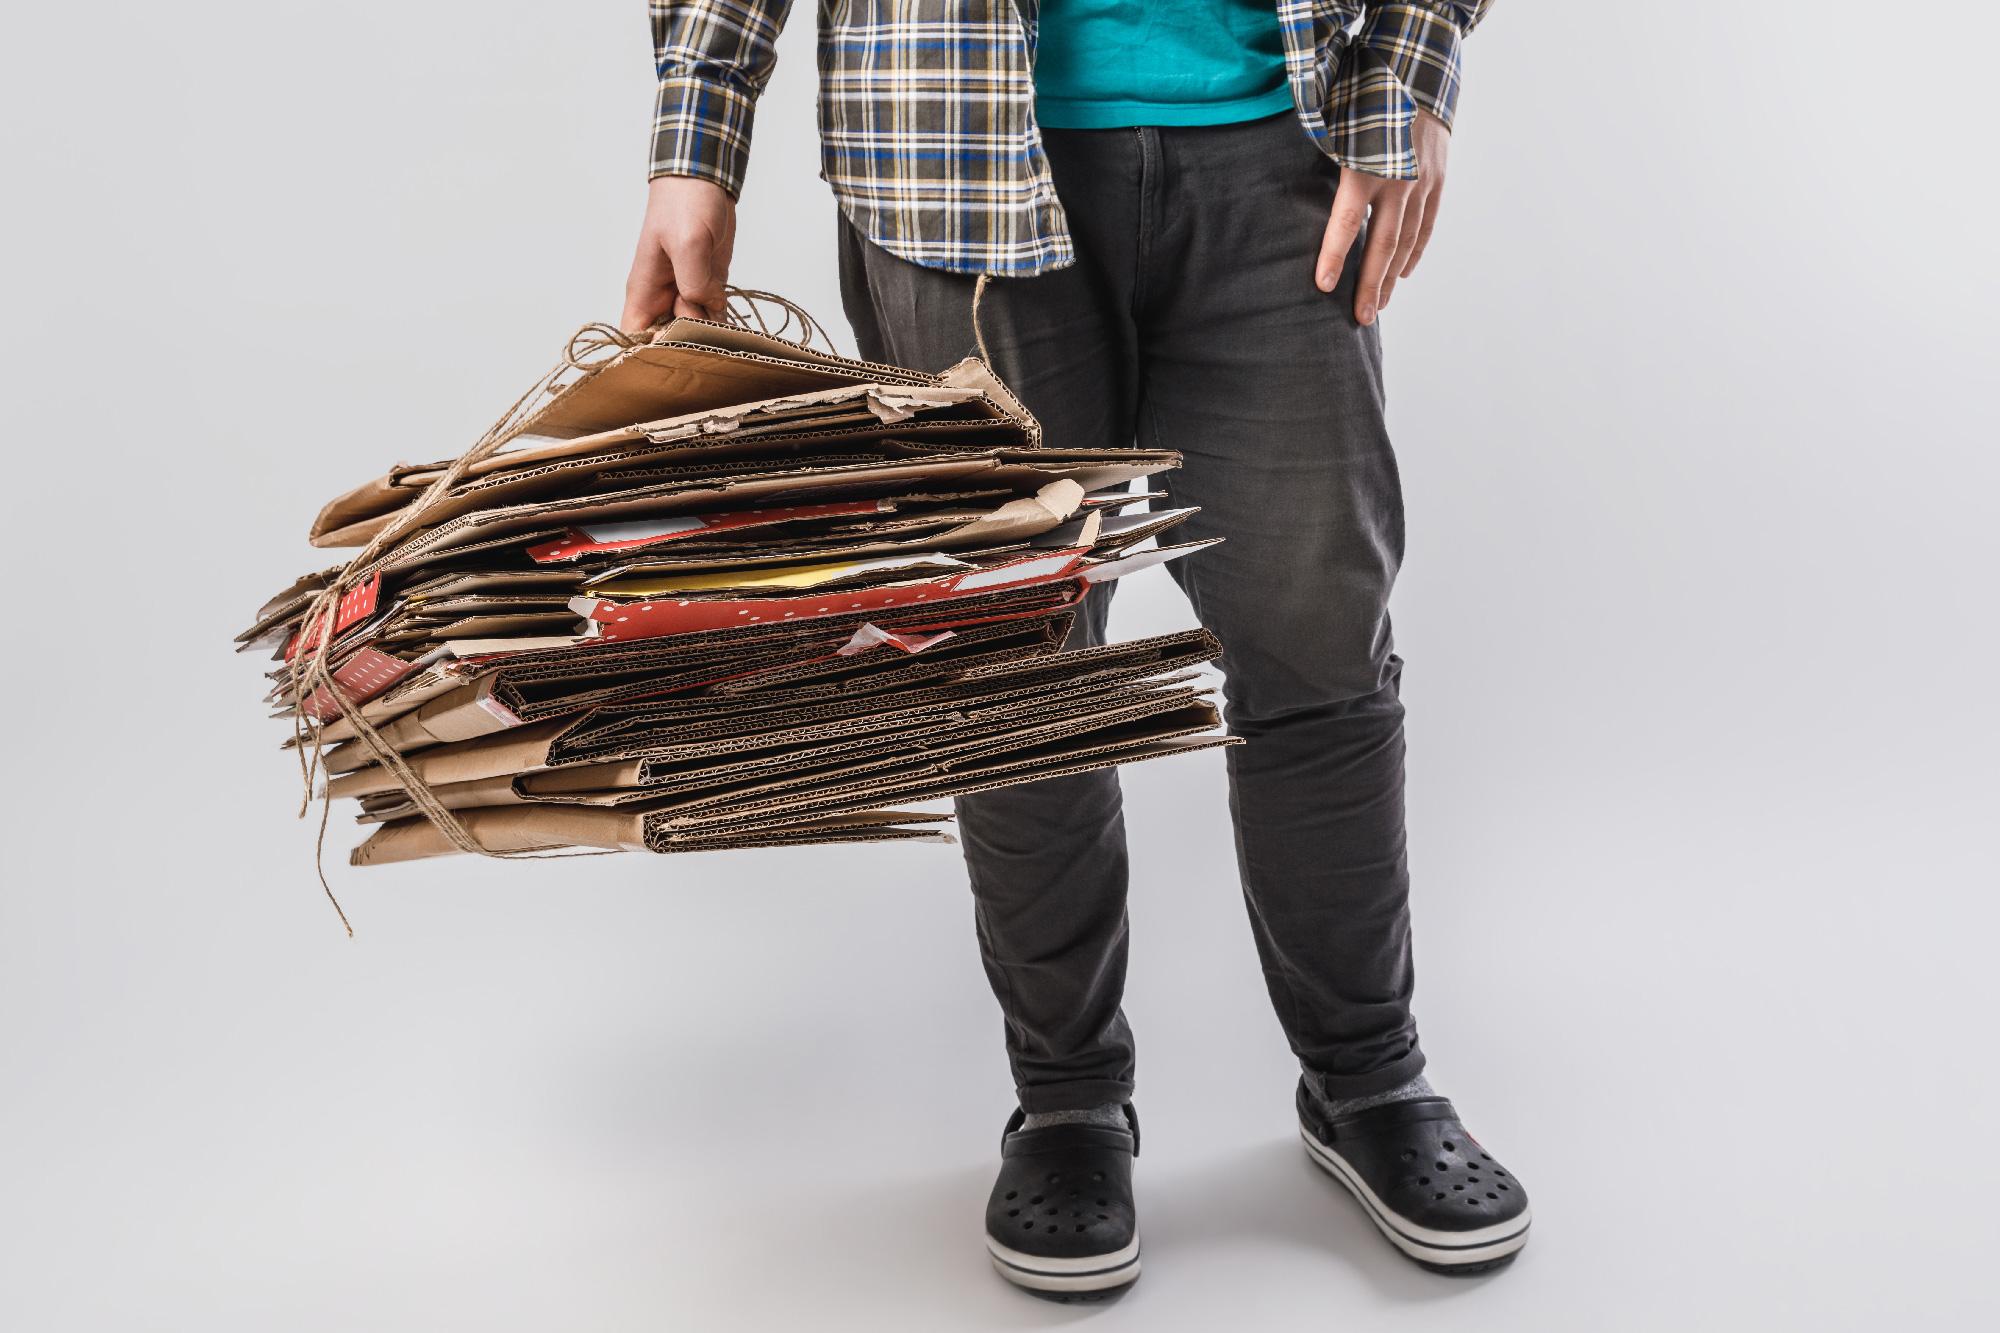 holding cardboard